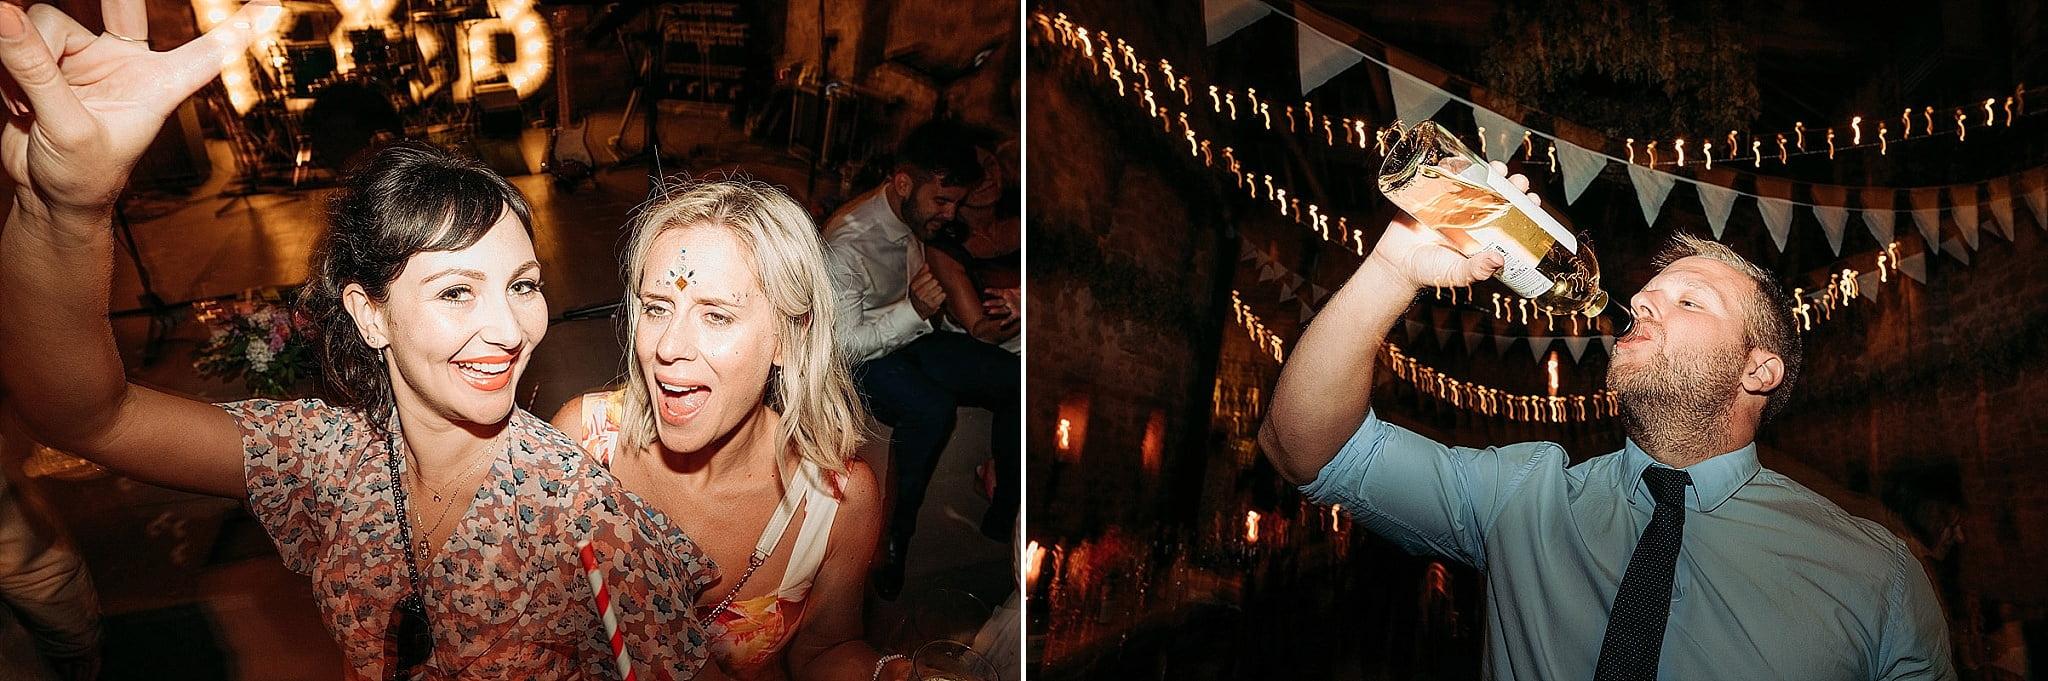 Lyde Court Wedding - Becky + Rhys 91